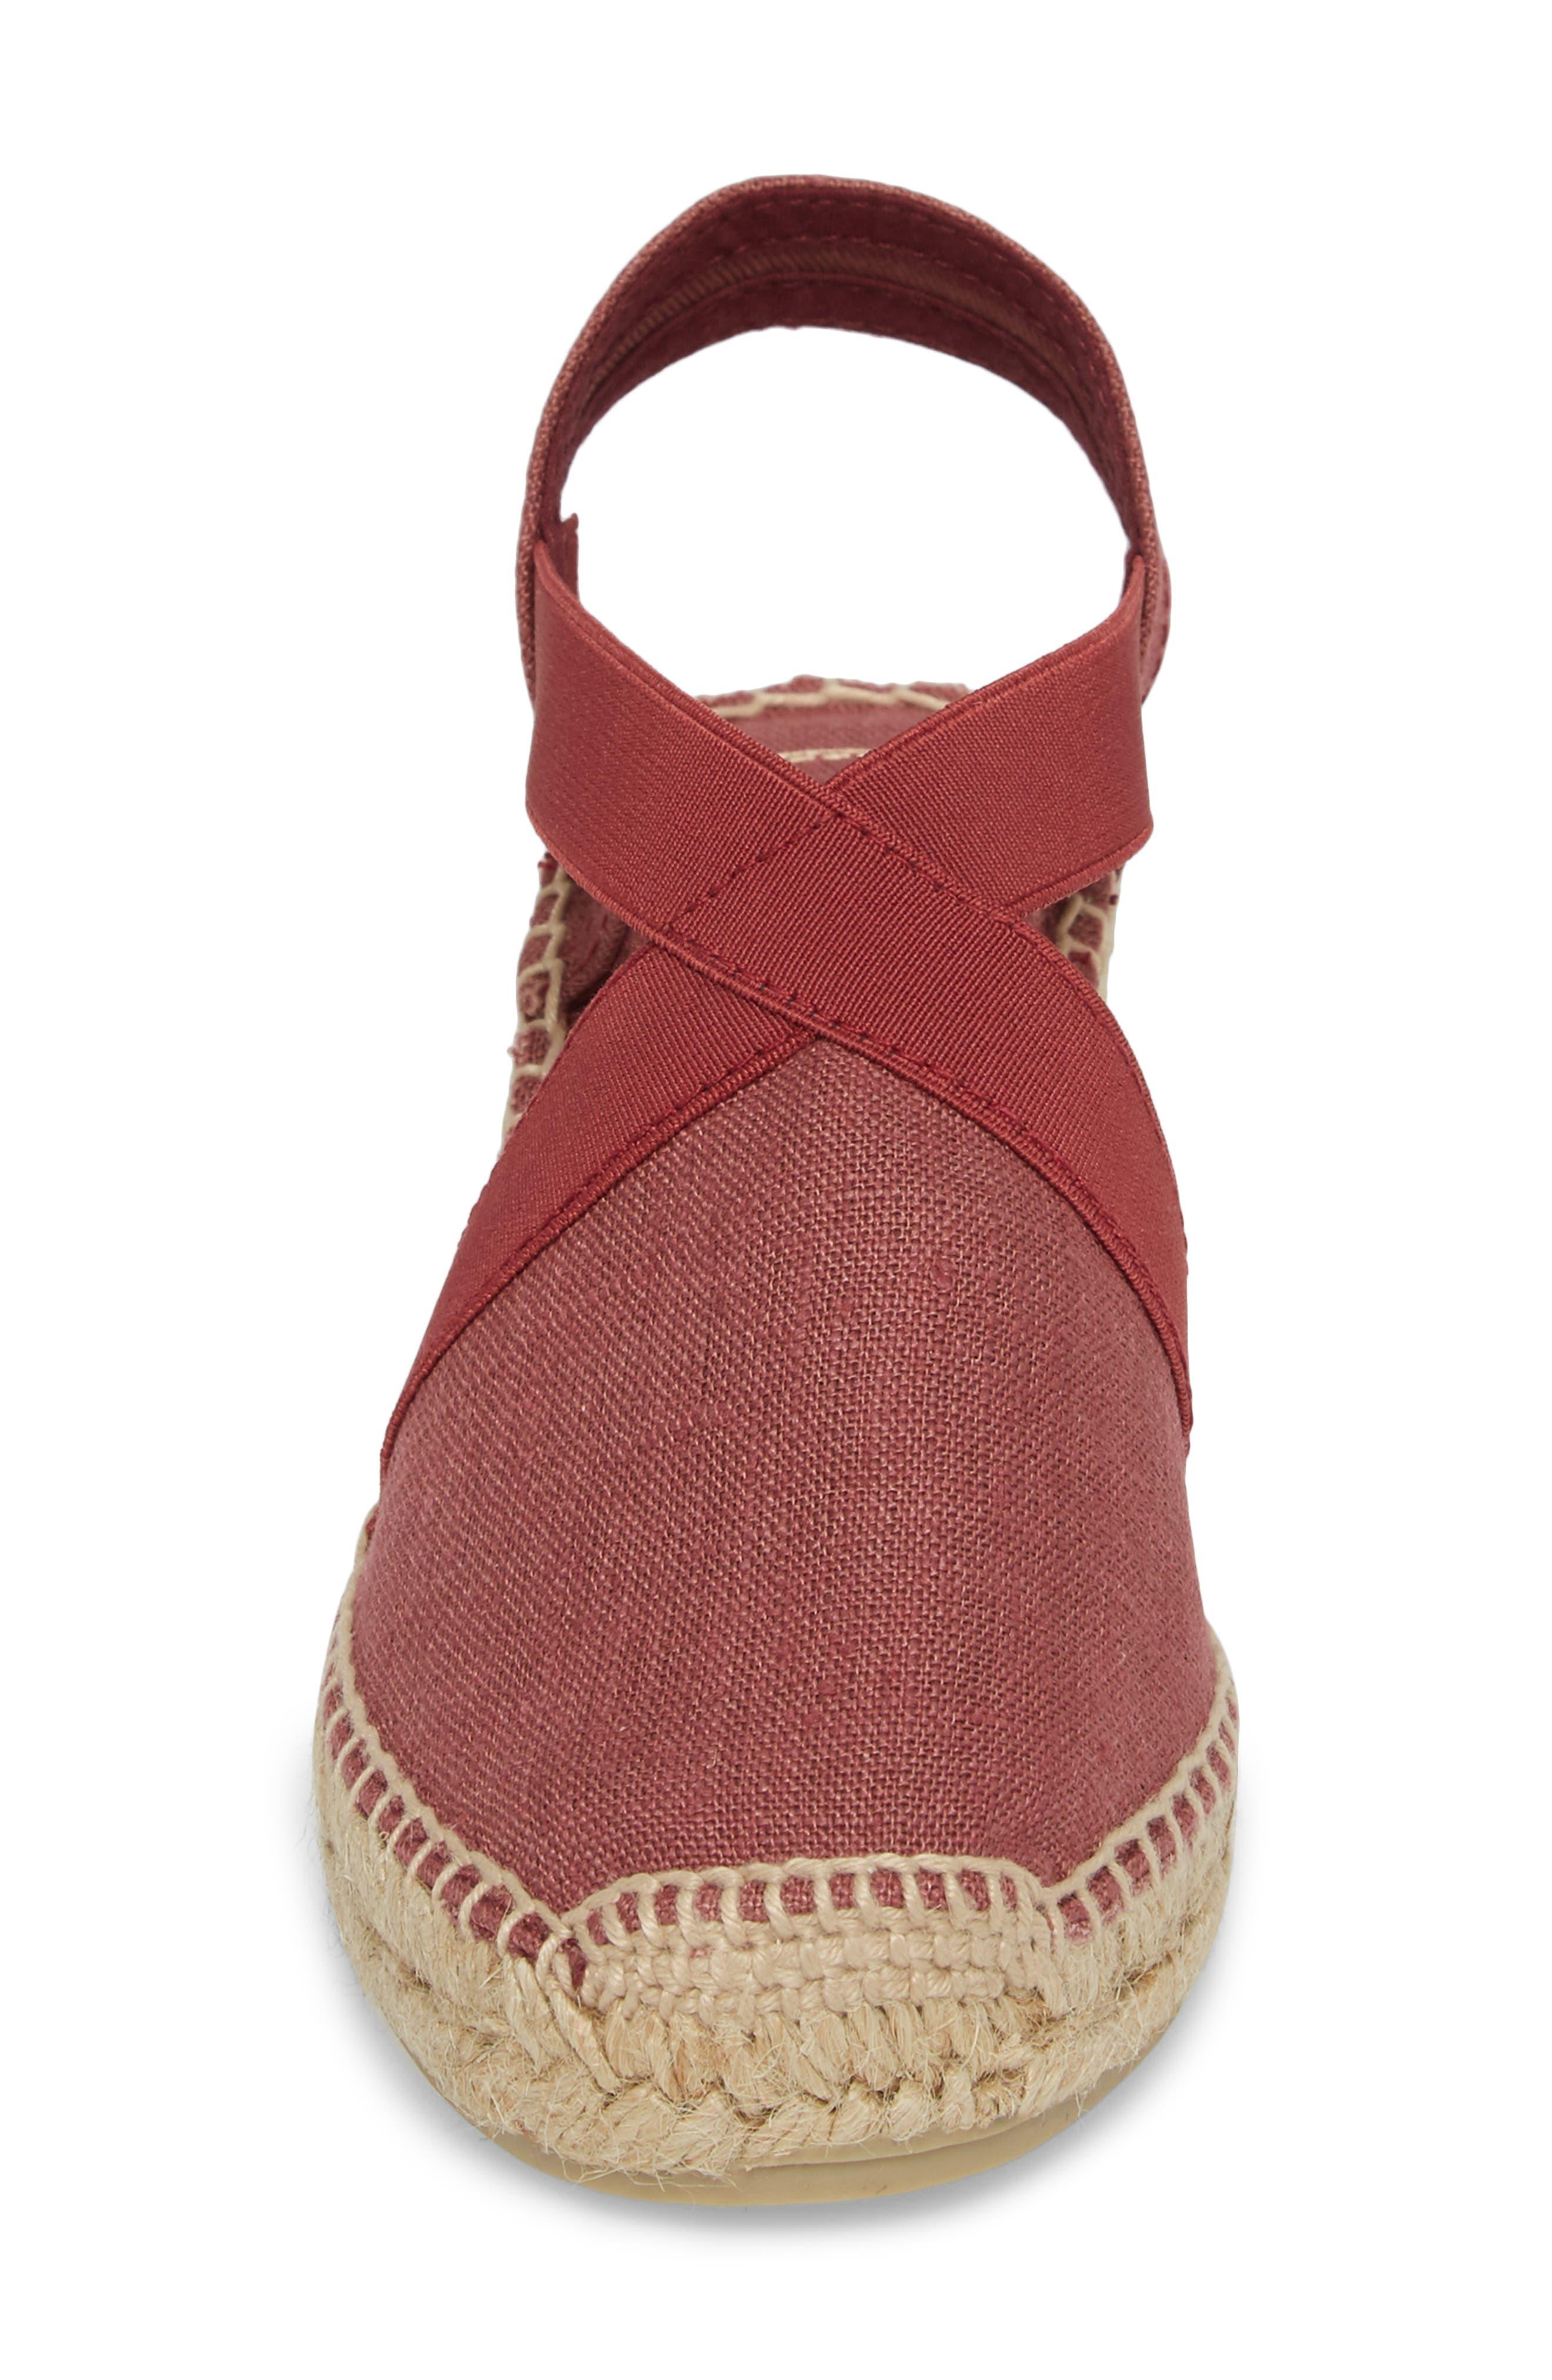 'Ter' Slingback Espadrille Sandal,                             Alternate thumbnail 4, color,                             Bru Fabric